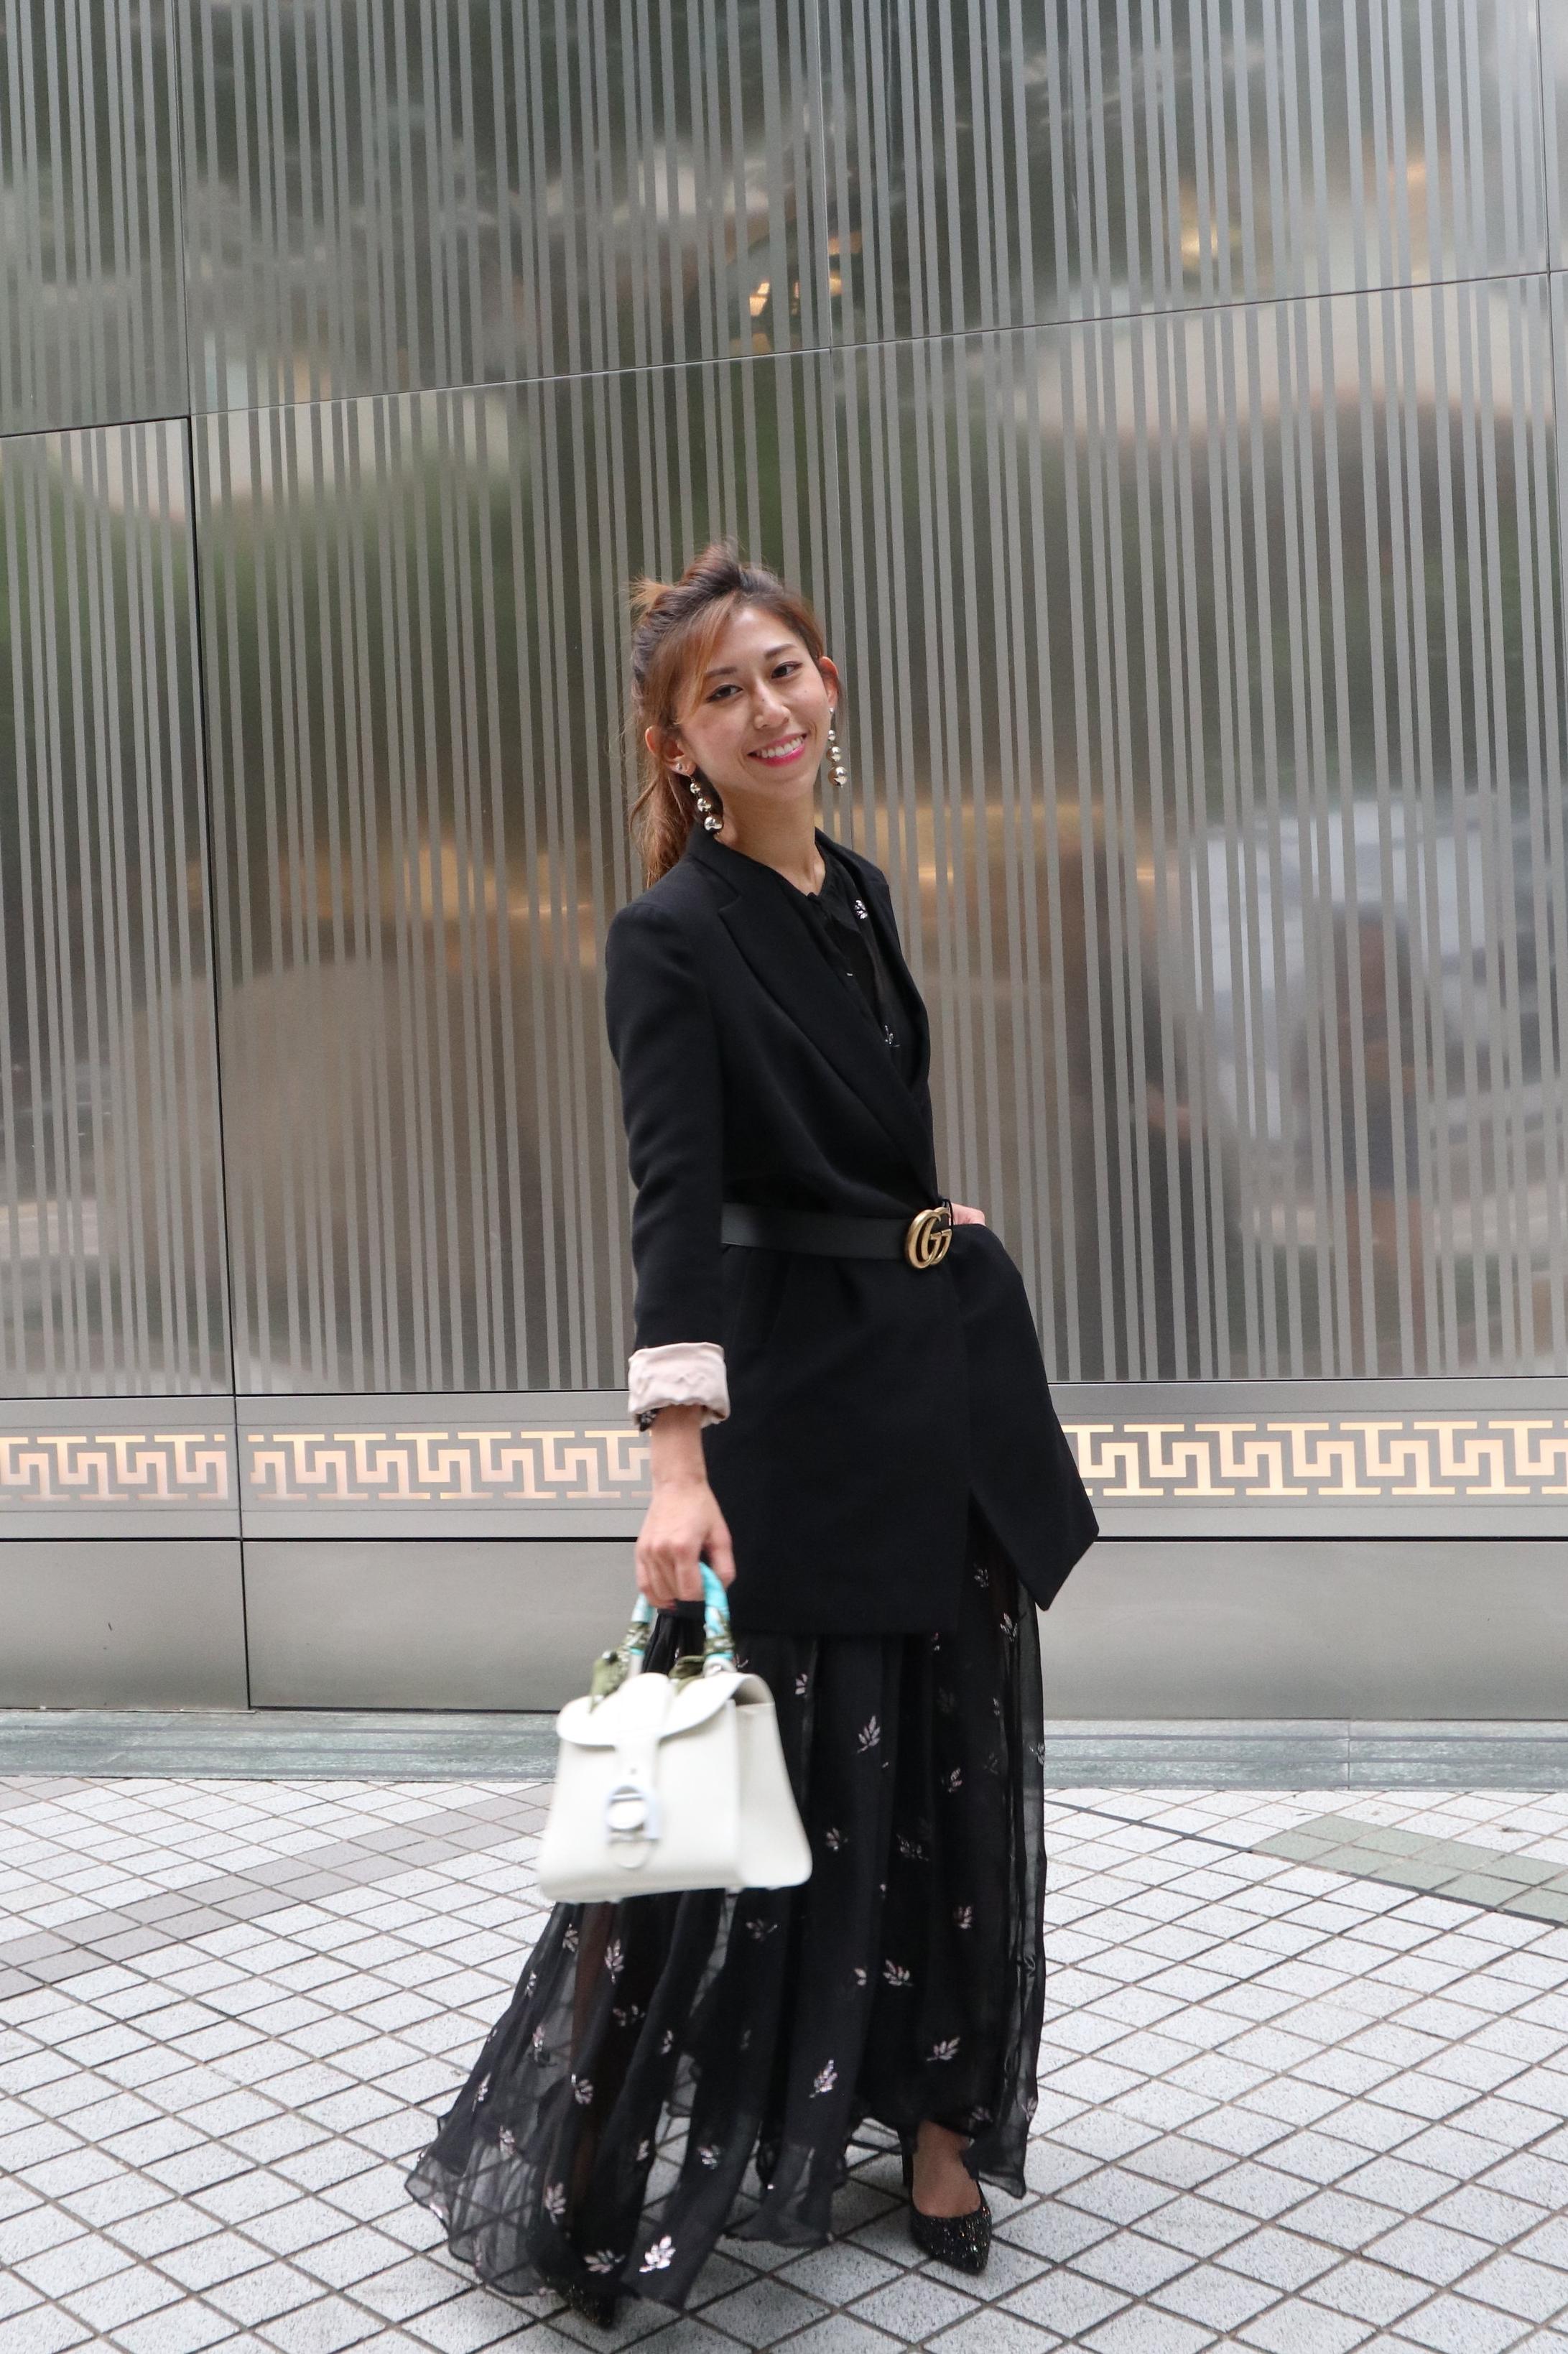 NastyGal maxi dress / Blazer from Korea /  Delvaux ivory brillant mini  /  Gucci leather belt with double G buckle  /  Jimmy Choo Romy 100 (rainbow and black multi coarse glitter fabric)